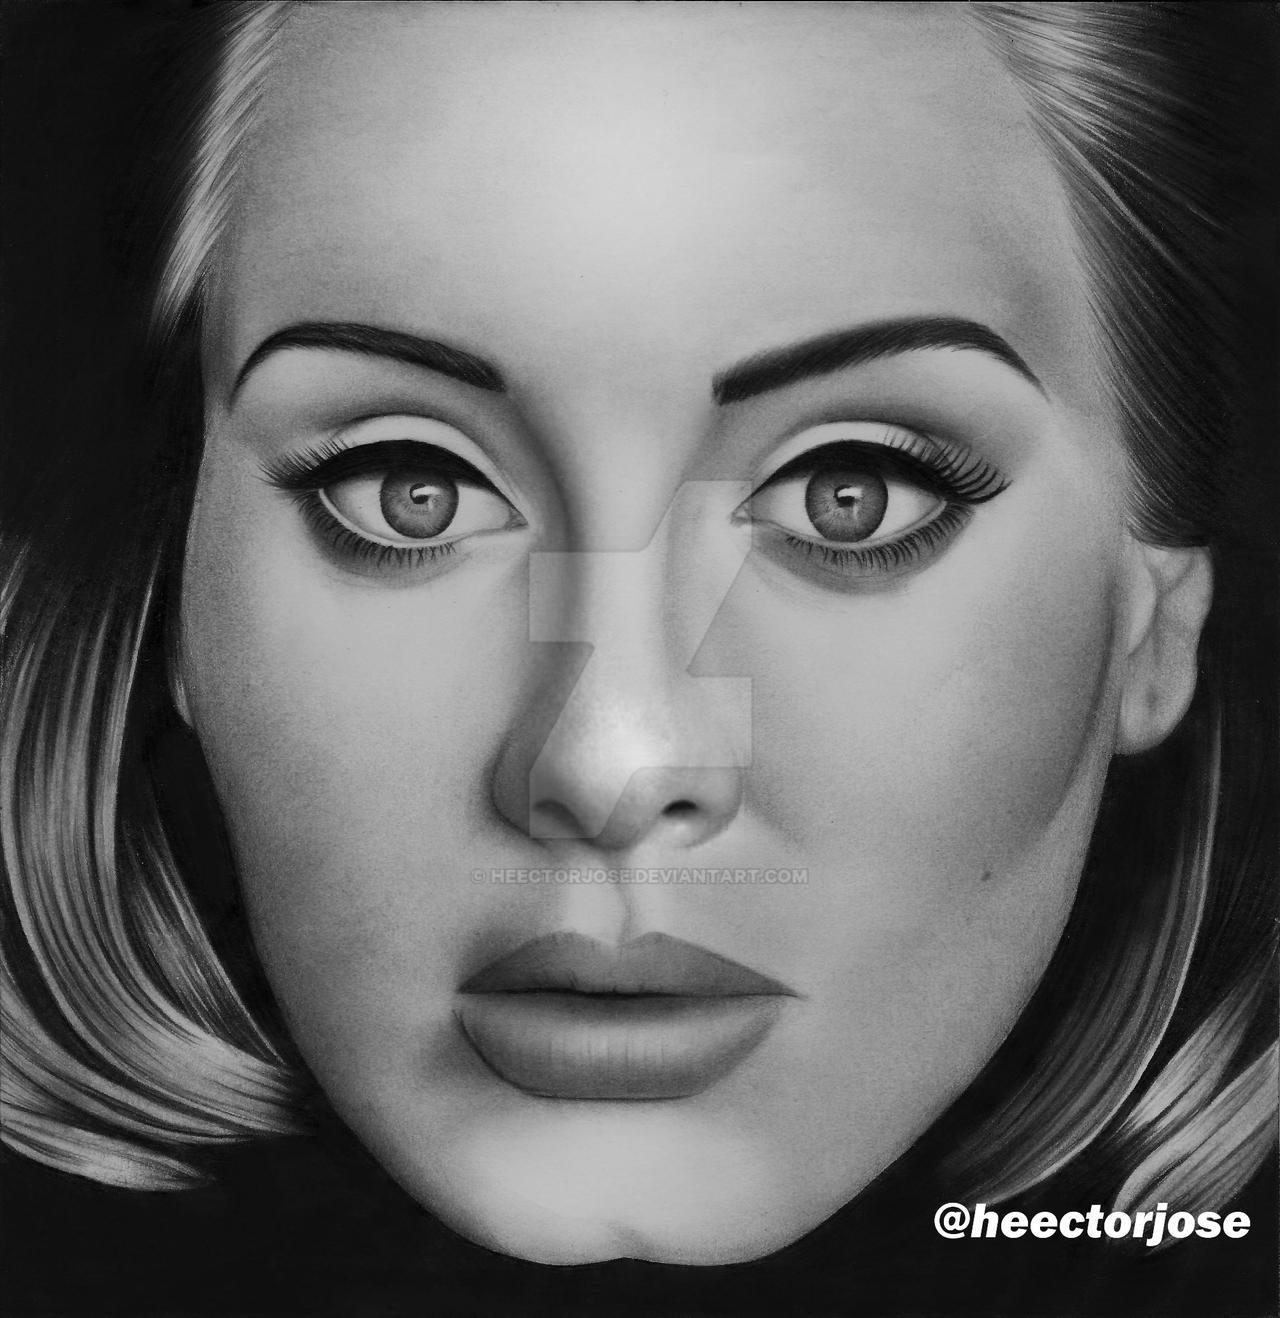 Adele by heectorjose